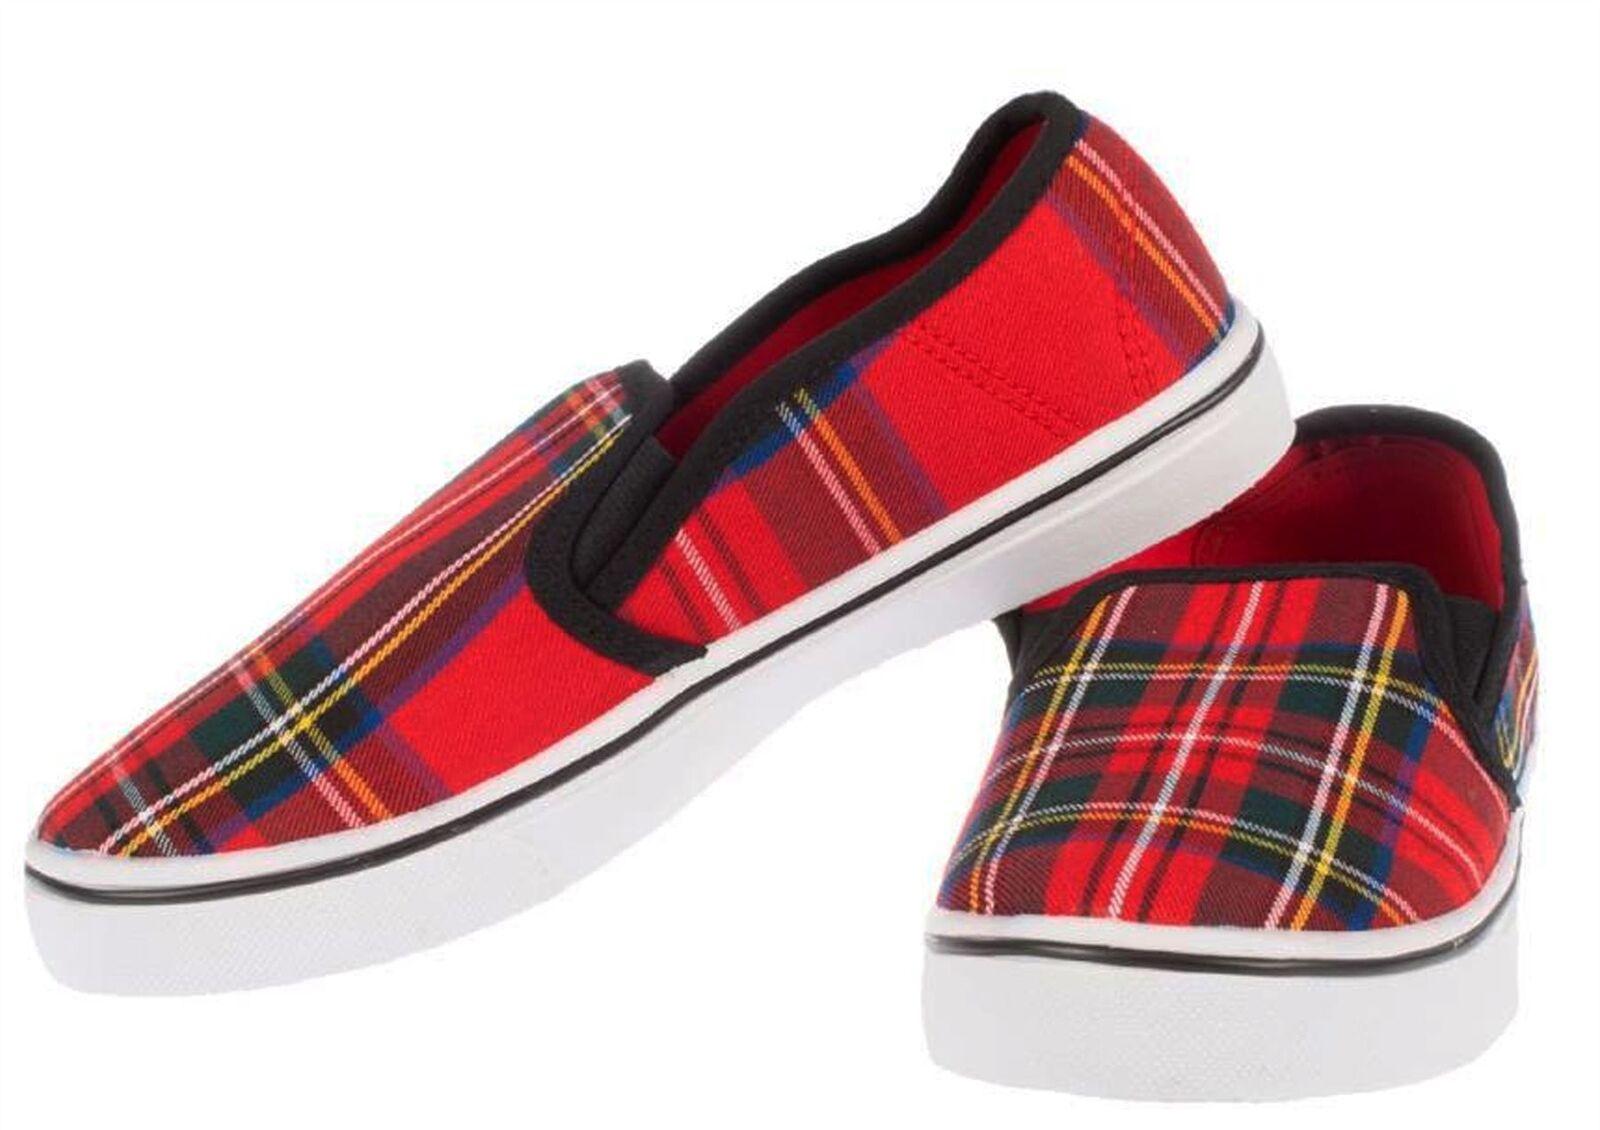 Unisex Canvas shoes in Stewart Royal Tartan Design Size 7